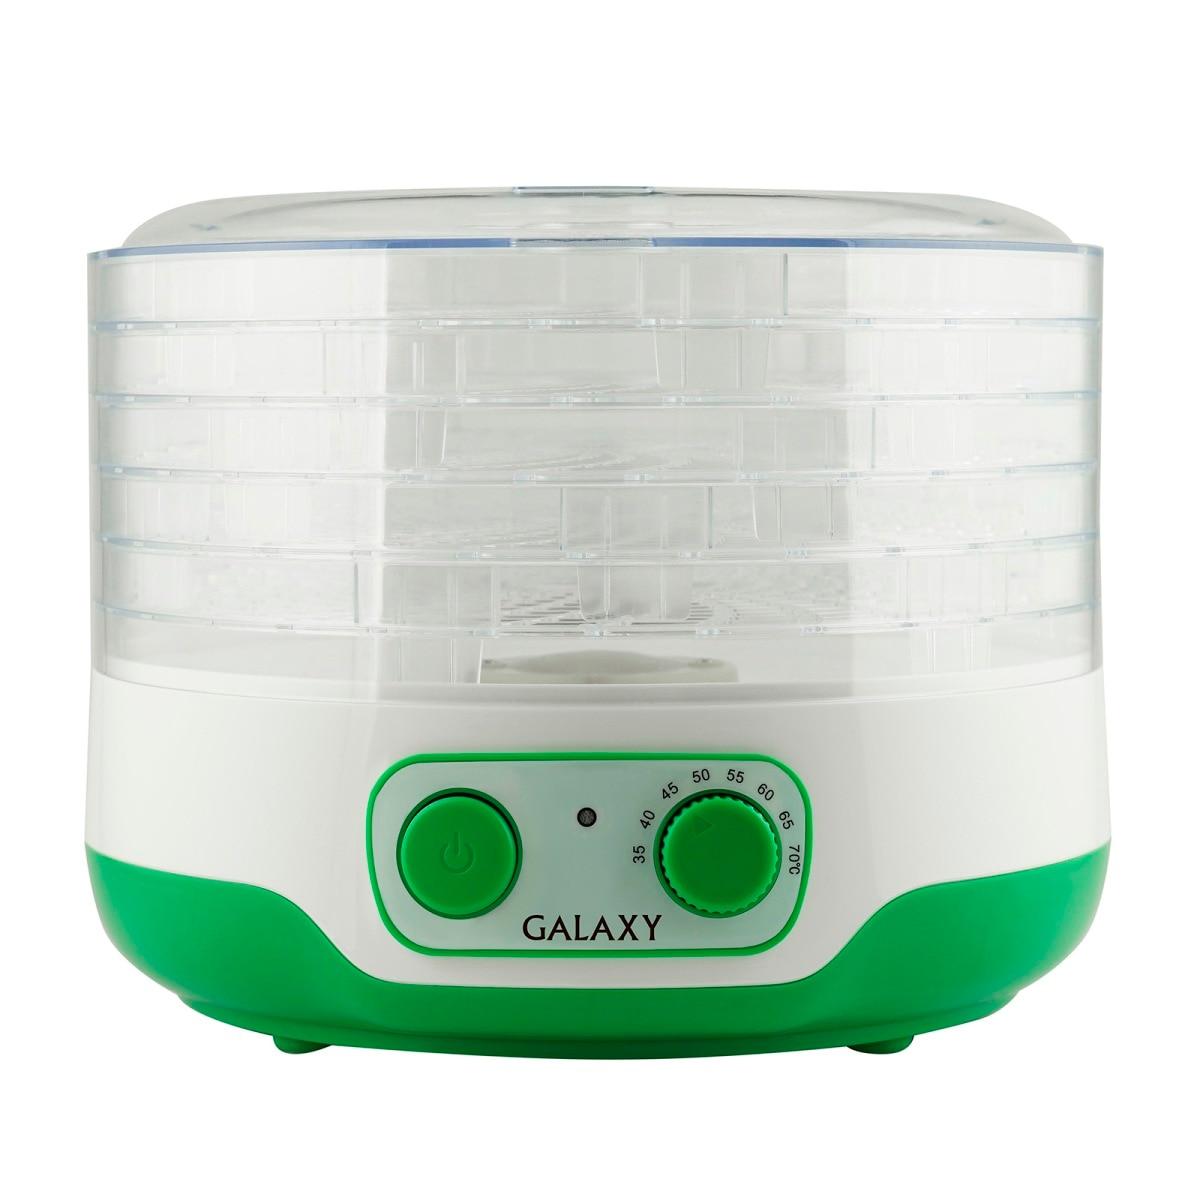 Dryer electric Galaxy GL2634 mini foldable hair dryer 1800w 220v student household high power hair dryer abs portable electric blower eu plug km 6832